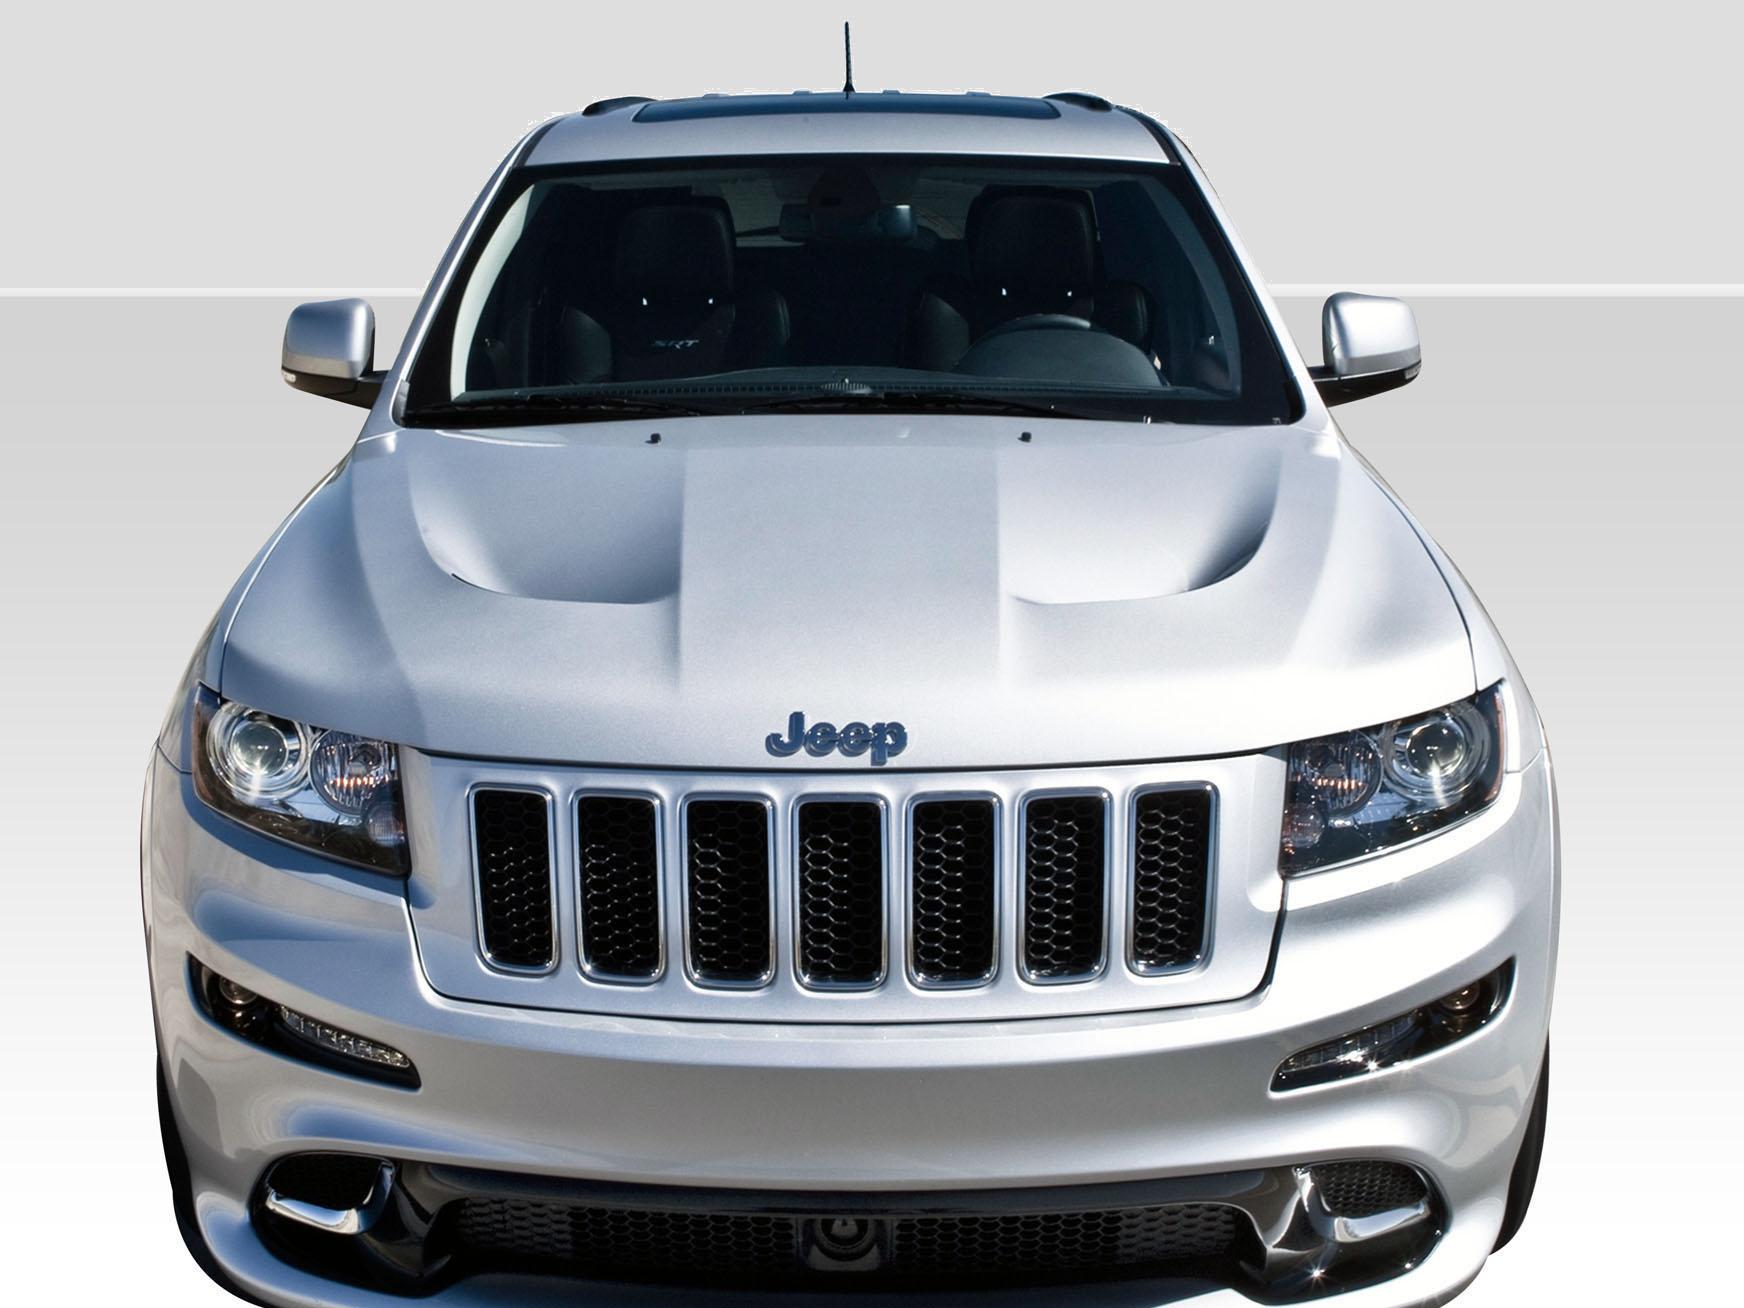 2011-2015 Jeep Grand Cherokee Duraflex SRT Look Hood - 1 Piece